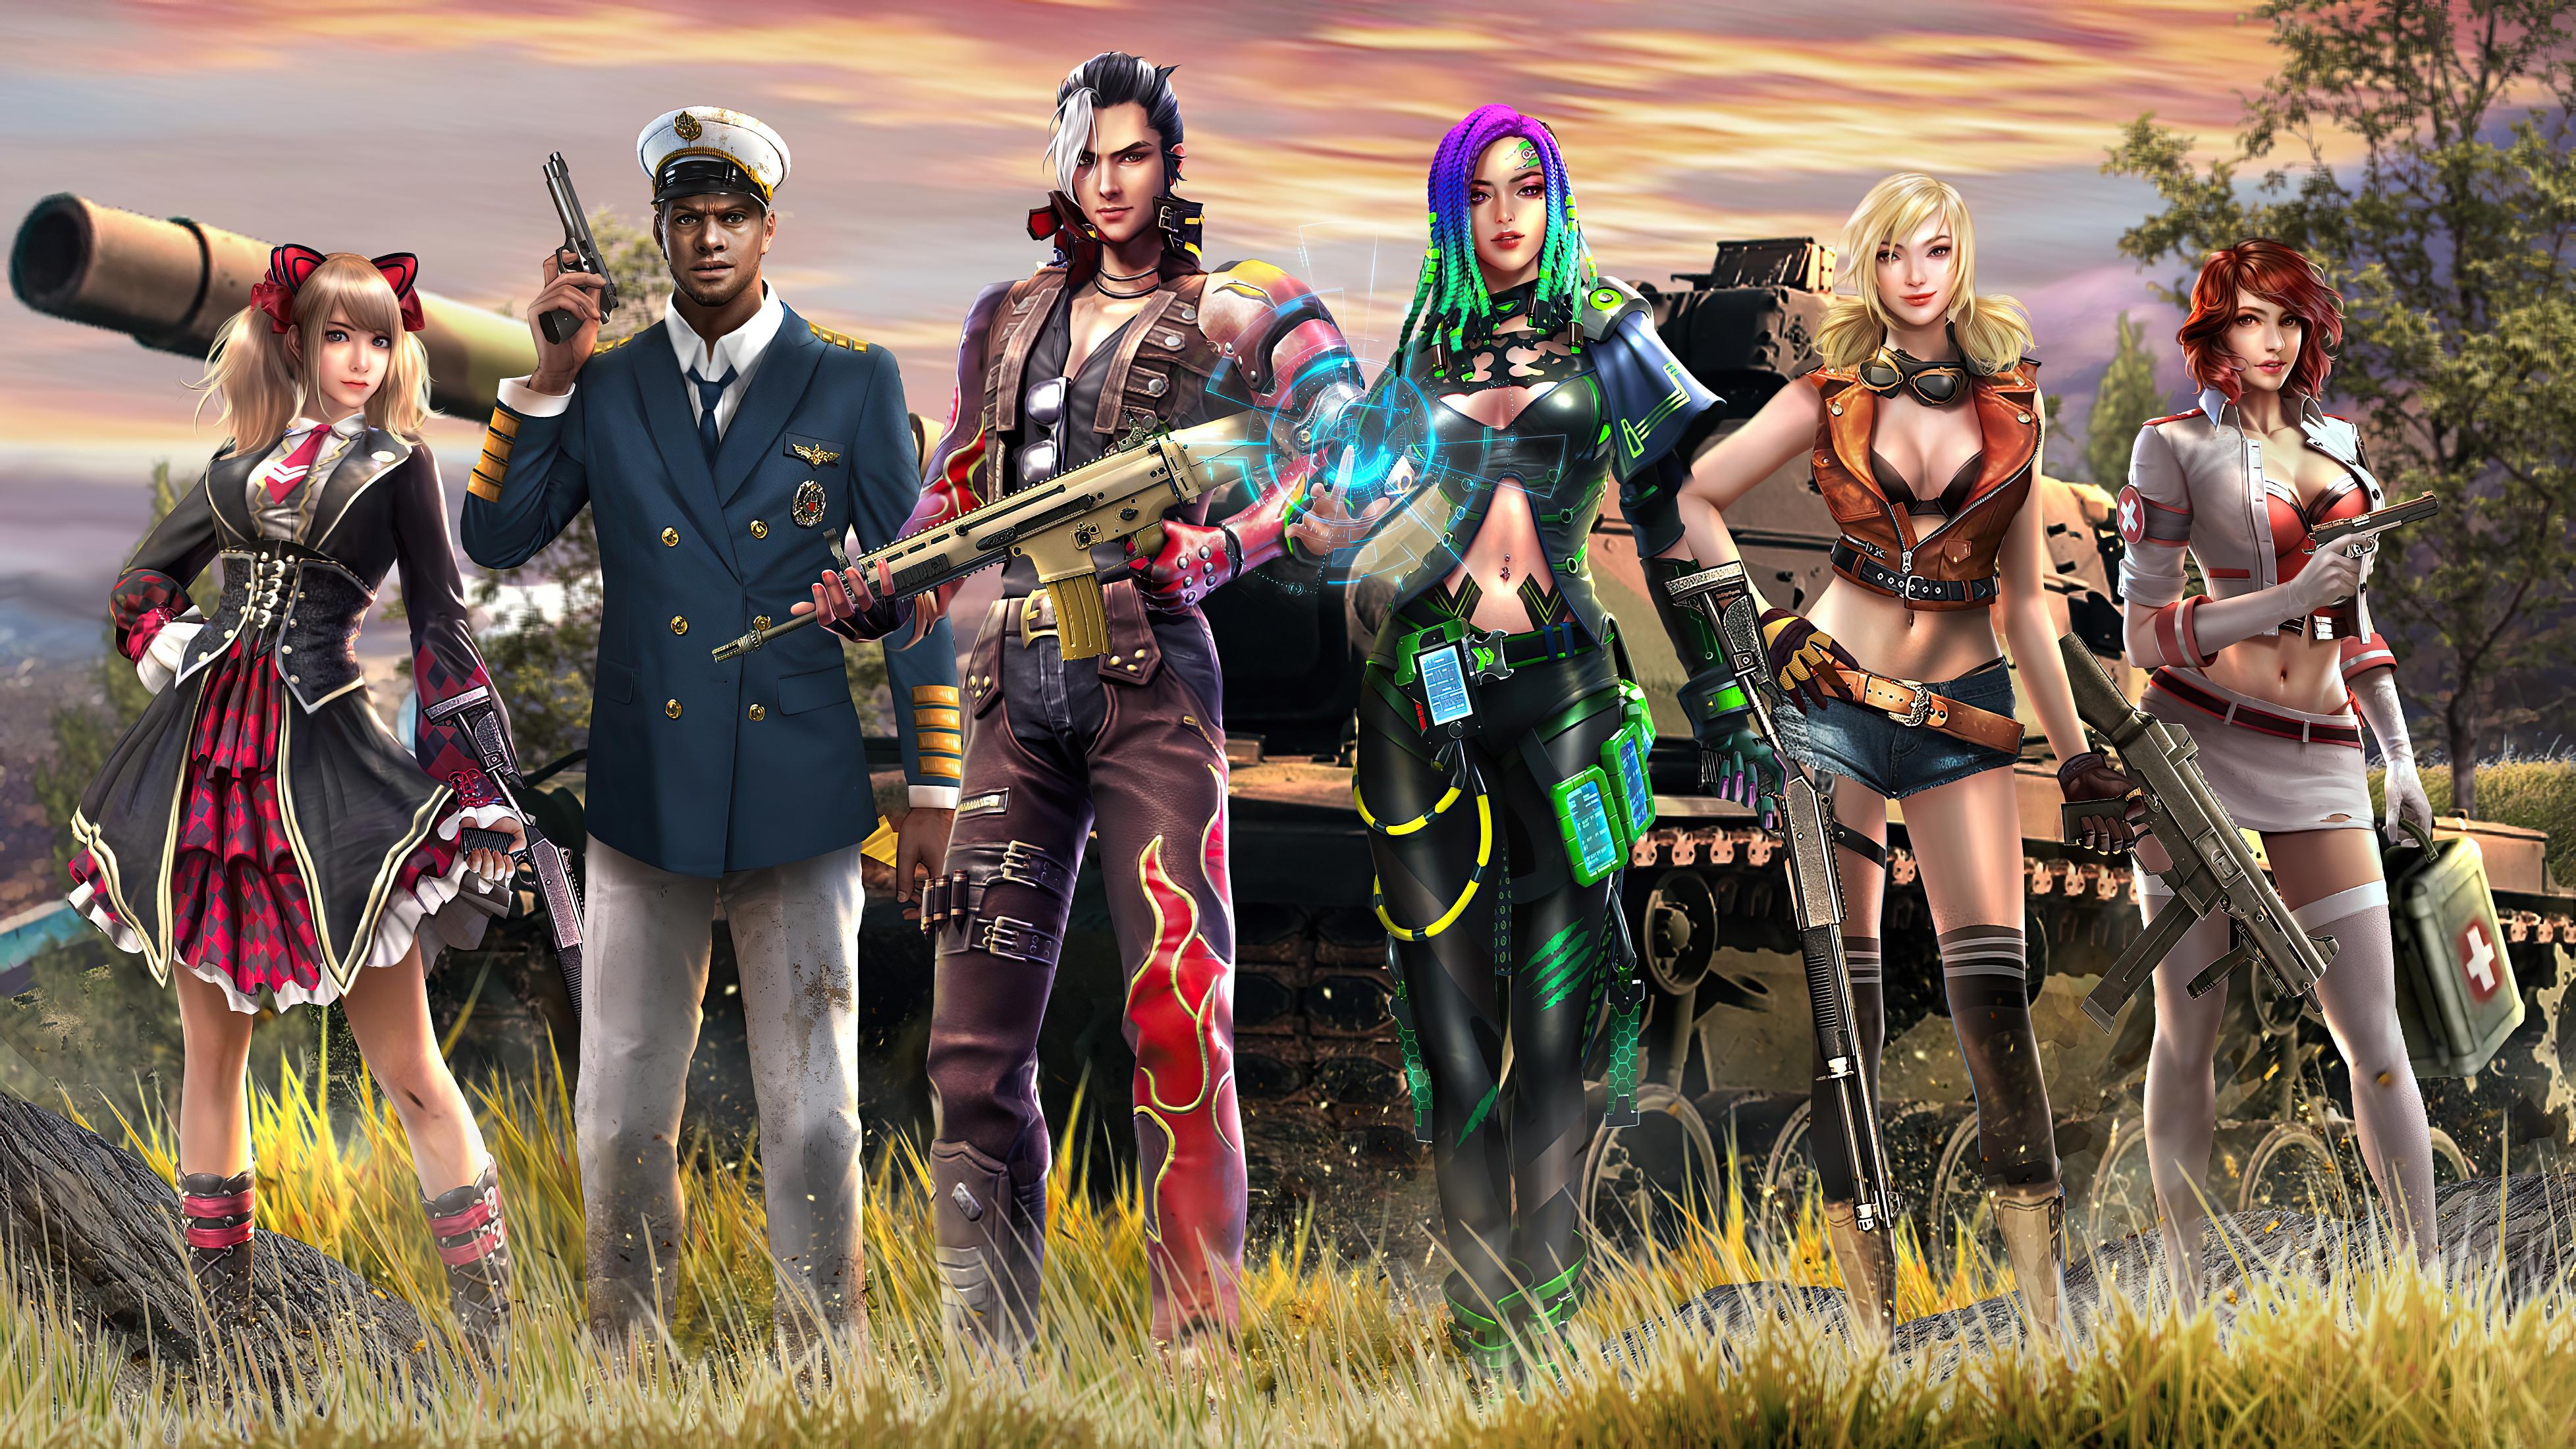 Poster KeArt Garena Free Fire Wallpaper, HD Games 4K ...